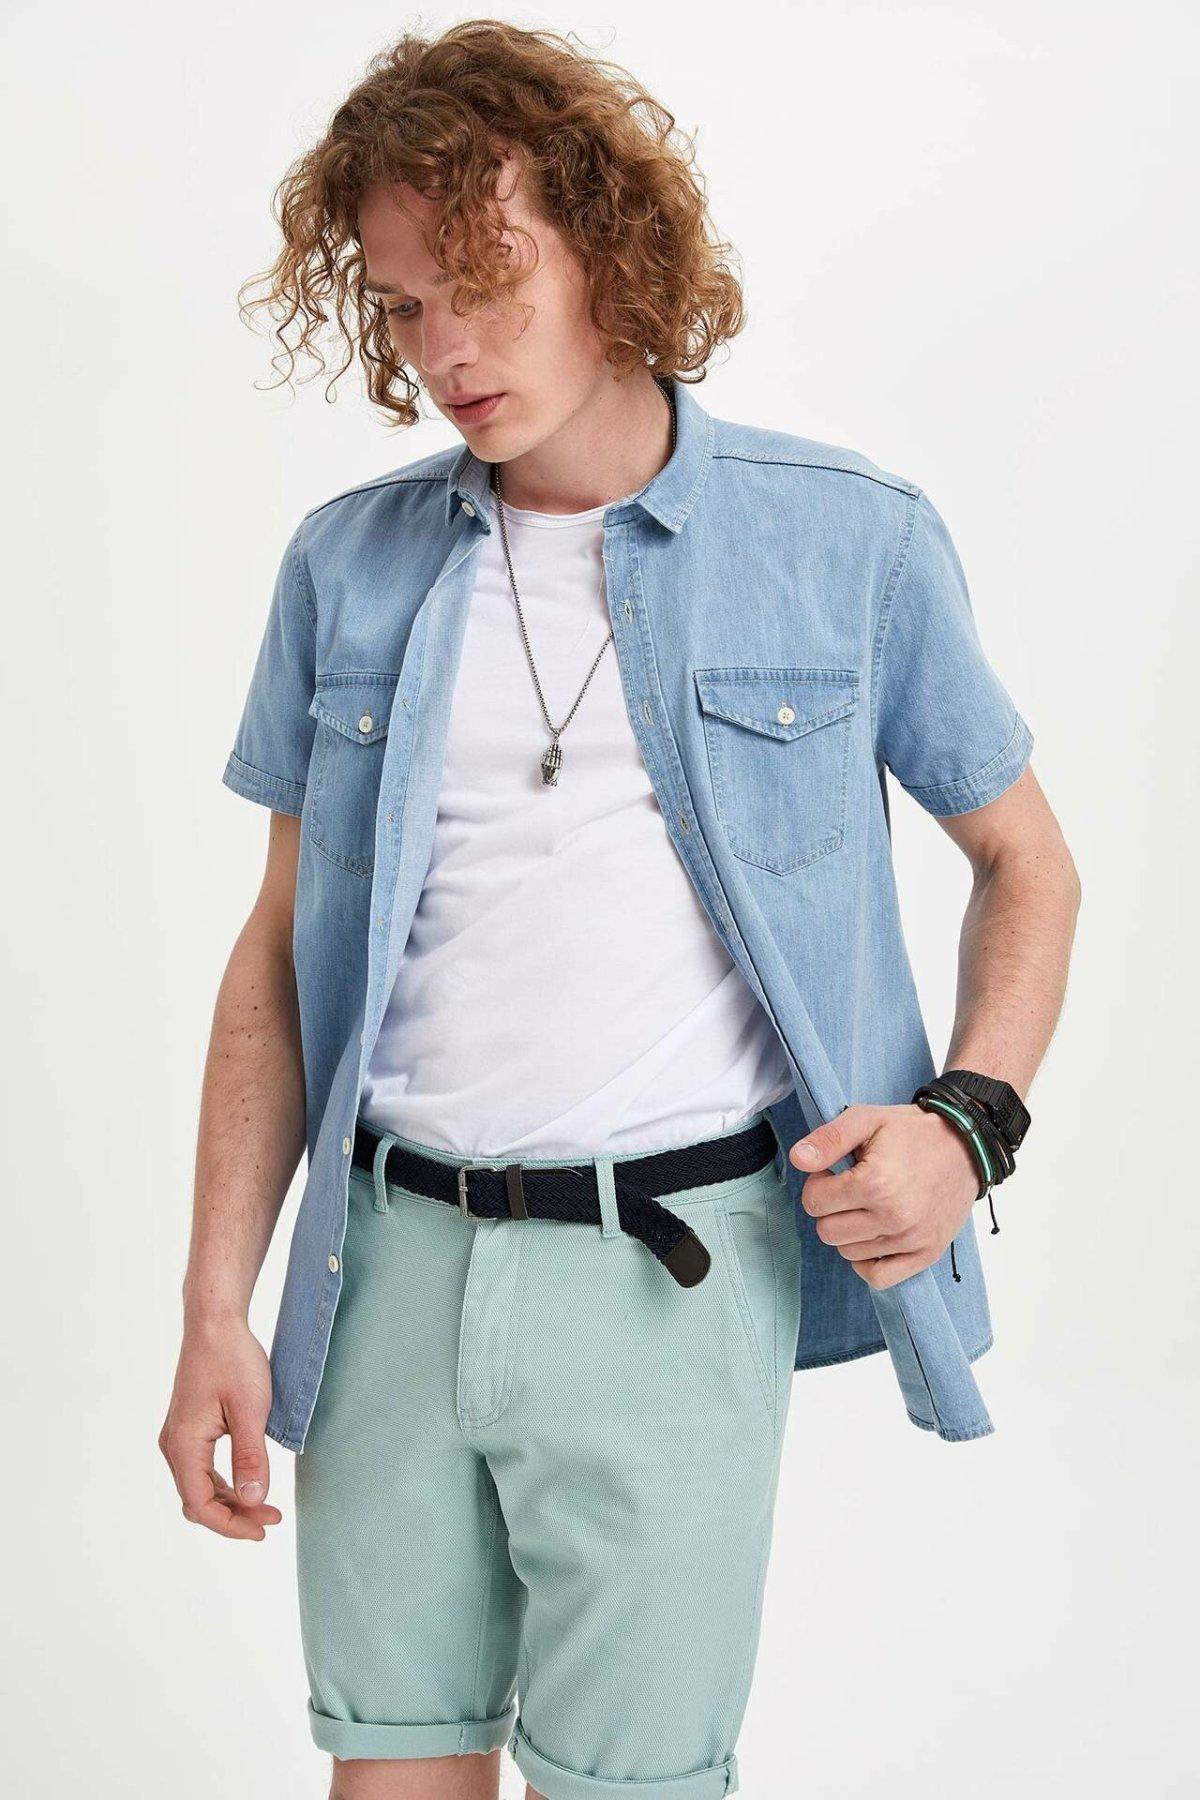 DeFacto Men Fashion Simple Solid Shirts Denim Short Sleeve Shirts Men Casual Lapel Collar Casual Shirt Tops New - K2049AZ19SM-K2049AZ19SM